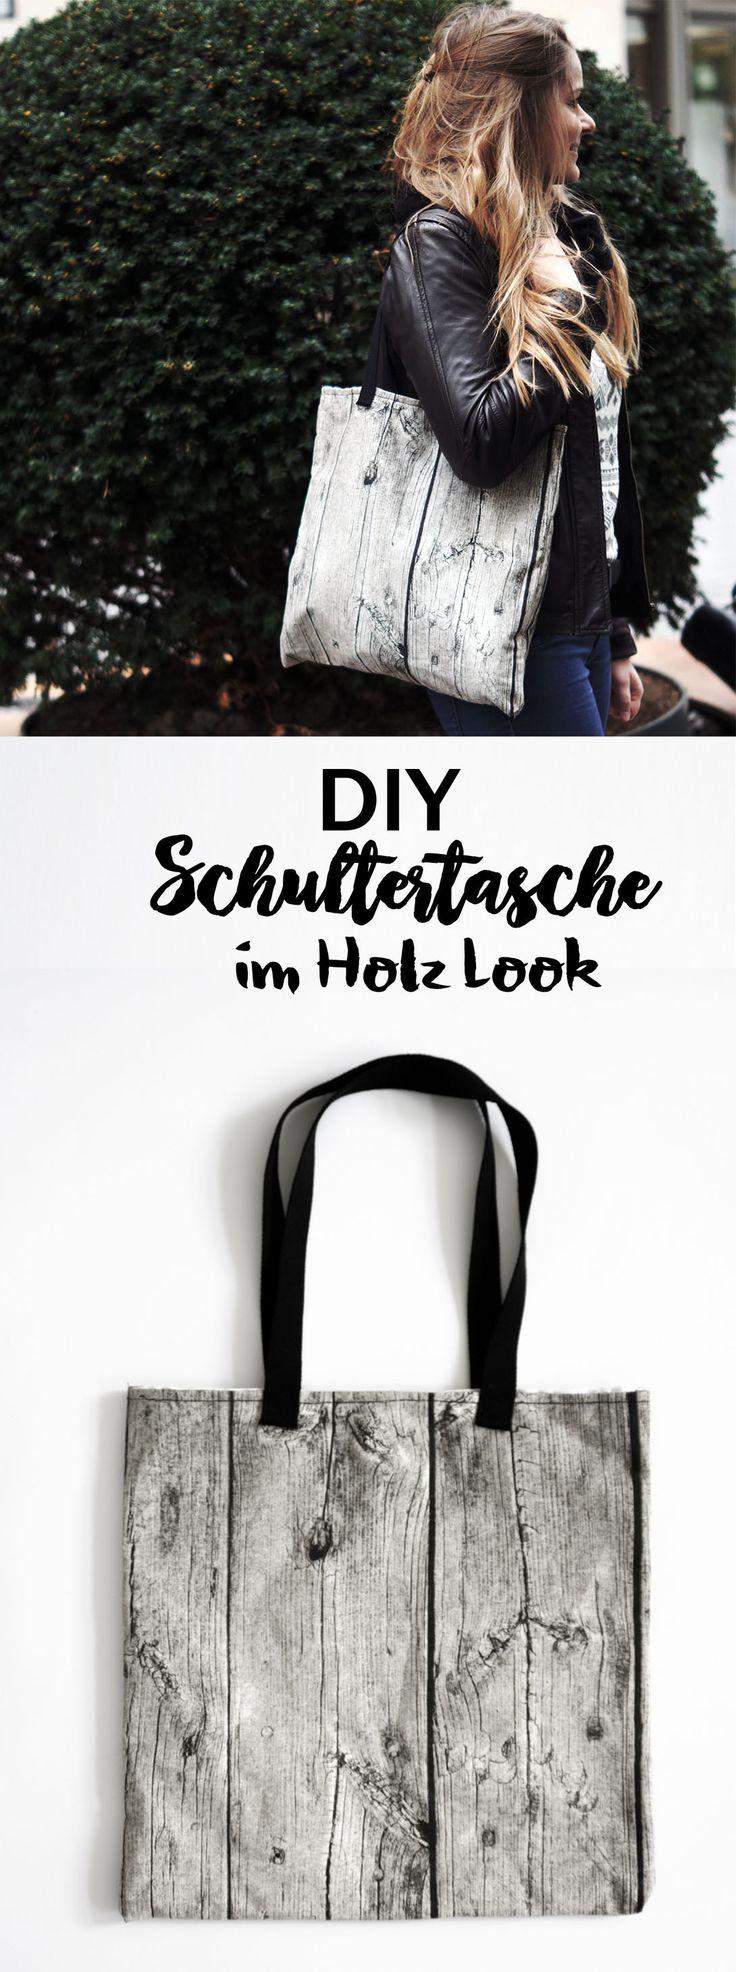 DIY Tasche Schultertasche Holz Look Design IKEA Skandi Design skandinavisch || Bag wood design || handmade || Nähen einfach|| sewing || DIY Mode fashion ideas accessories || Accessoires